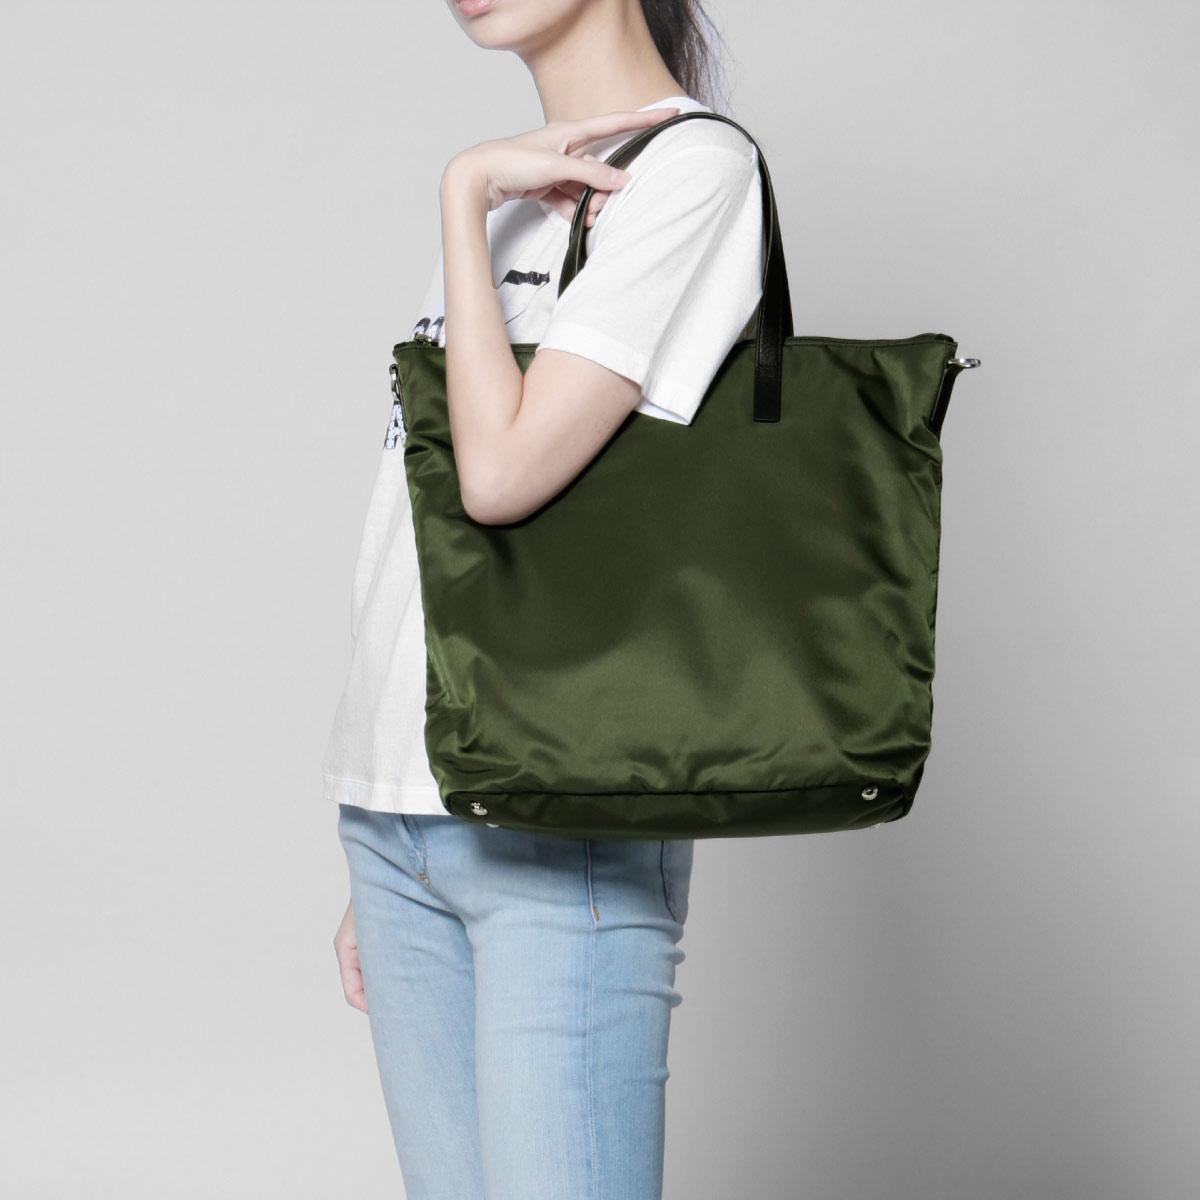 6ebaaee22d34ba ... Prada PRADA bag lady 1BG696 V44 F0161 shoulder tote bag MILITARE Green  belonging to